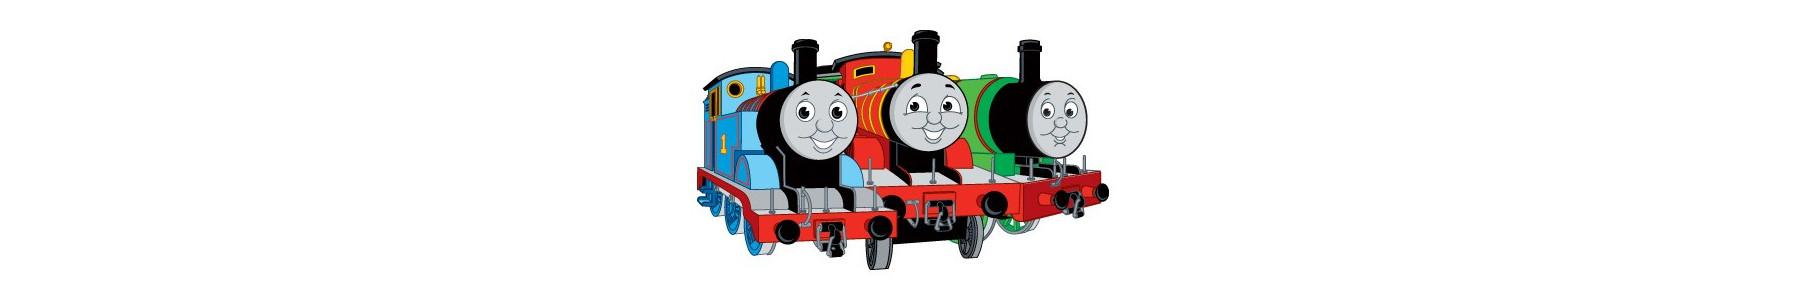 Colectia de articole party Trenuletul Thomas - farfurii Thomas, pahare Thomas, Servetele Thomas